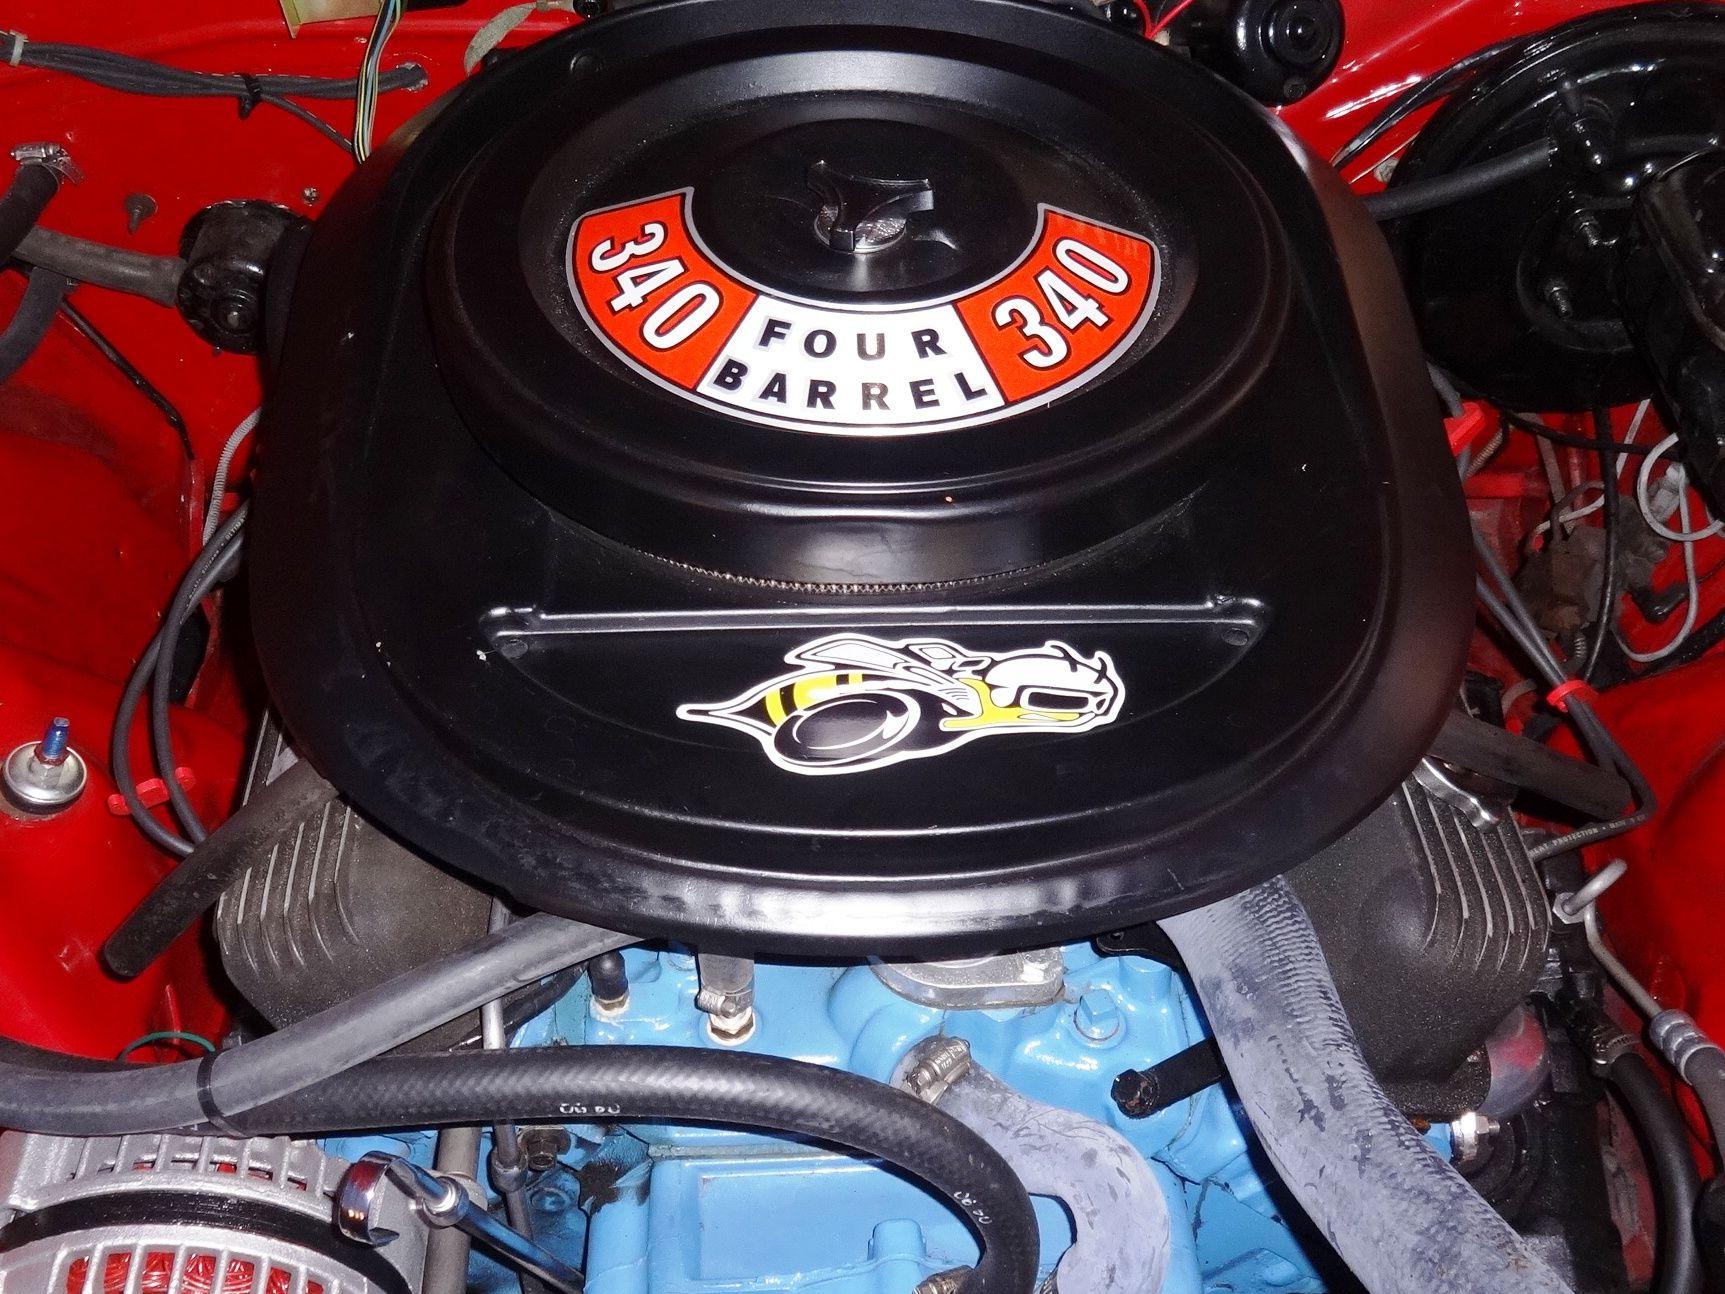 Chryslers Classic 340 Small Block V8